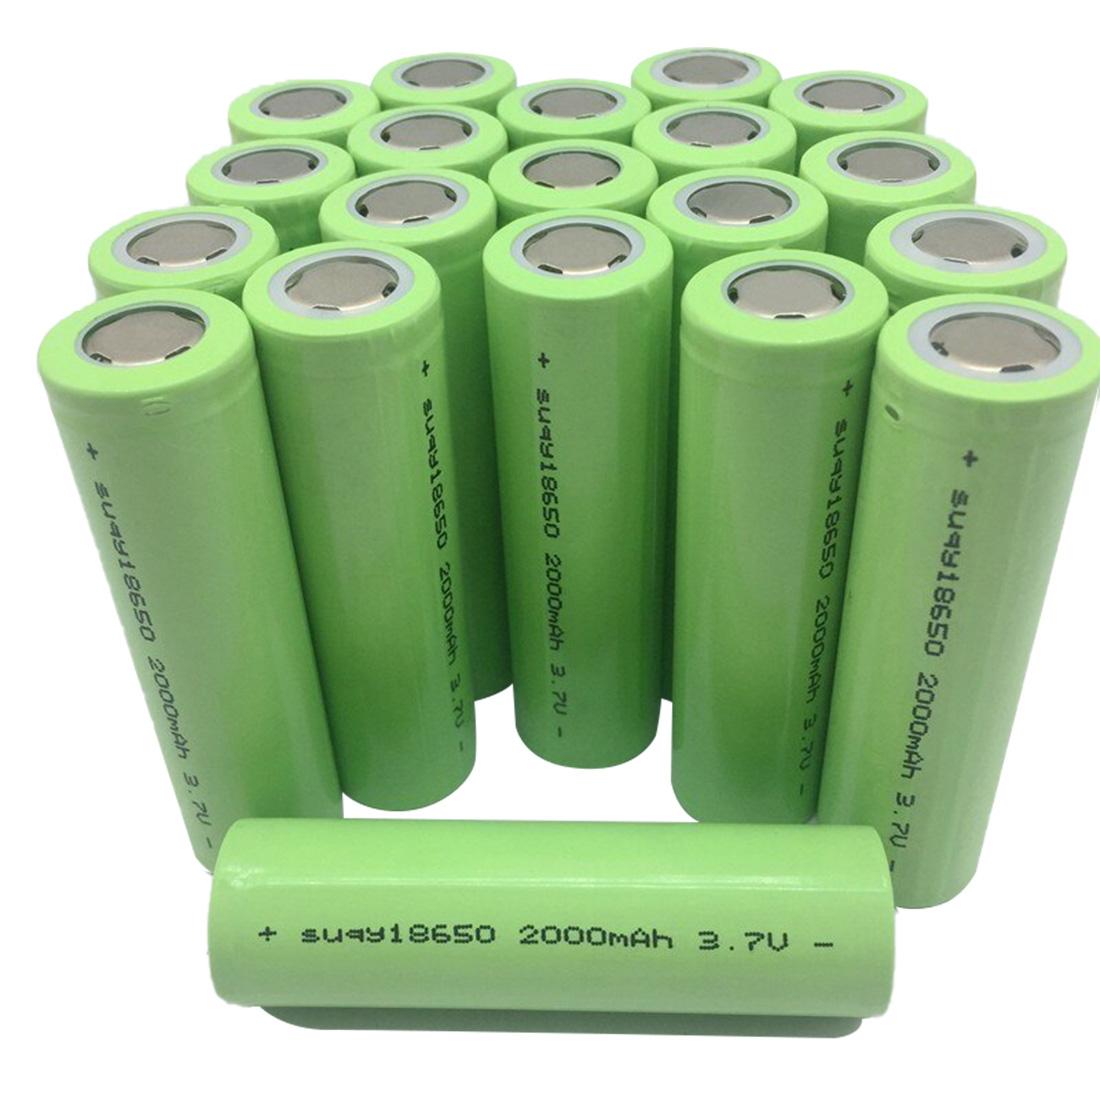 2000mAh 18650 Li-ion akkumulátor